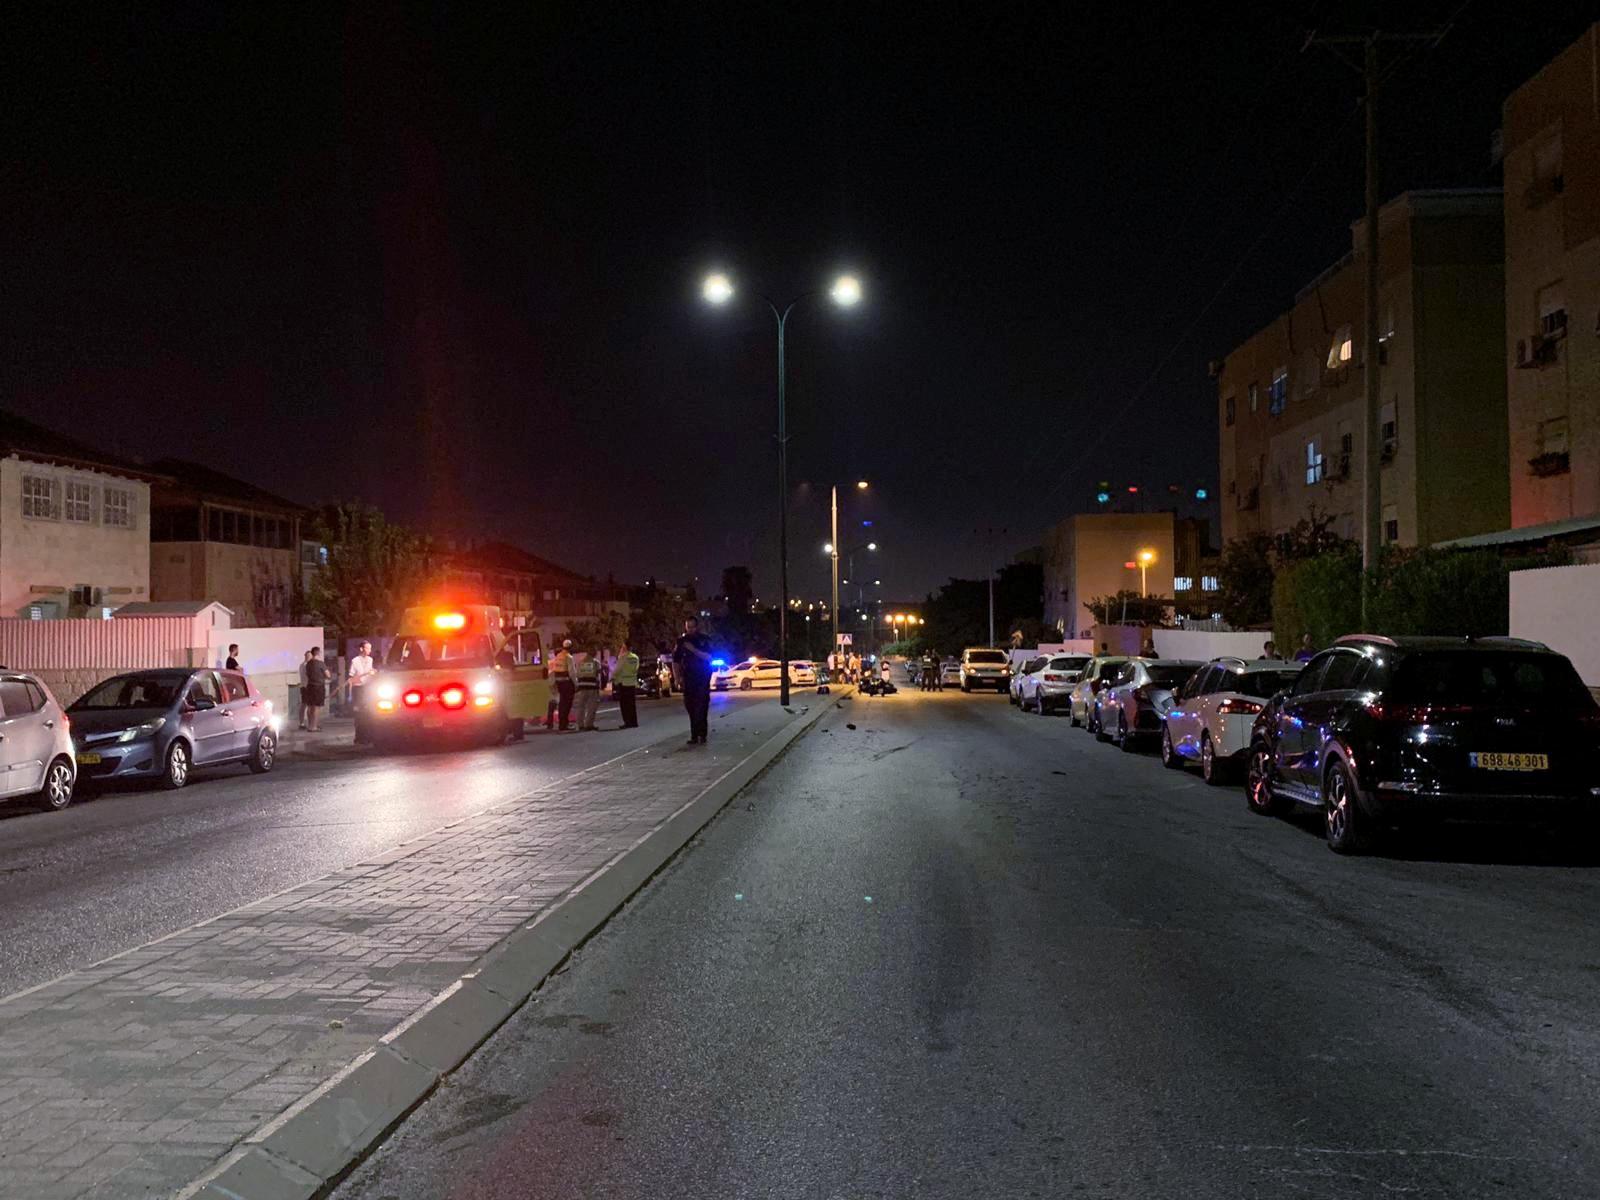 Photo of תאונה קטלנית ברחוב אפריאט ברמלה. בת 70 נהרגה מפגיעת אופנוע עליו רכבו שני צעירים